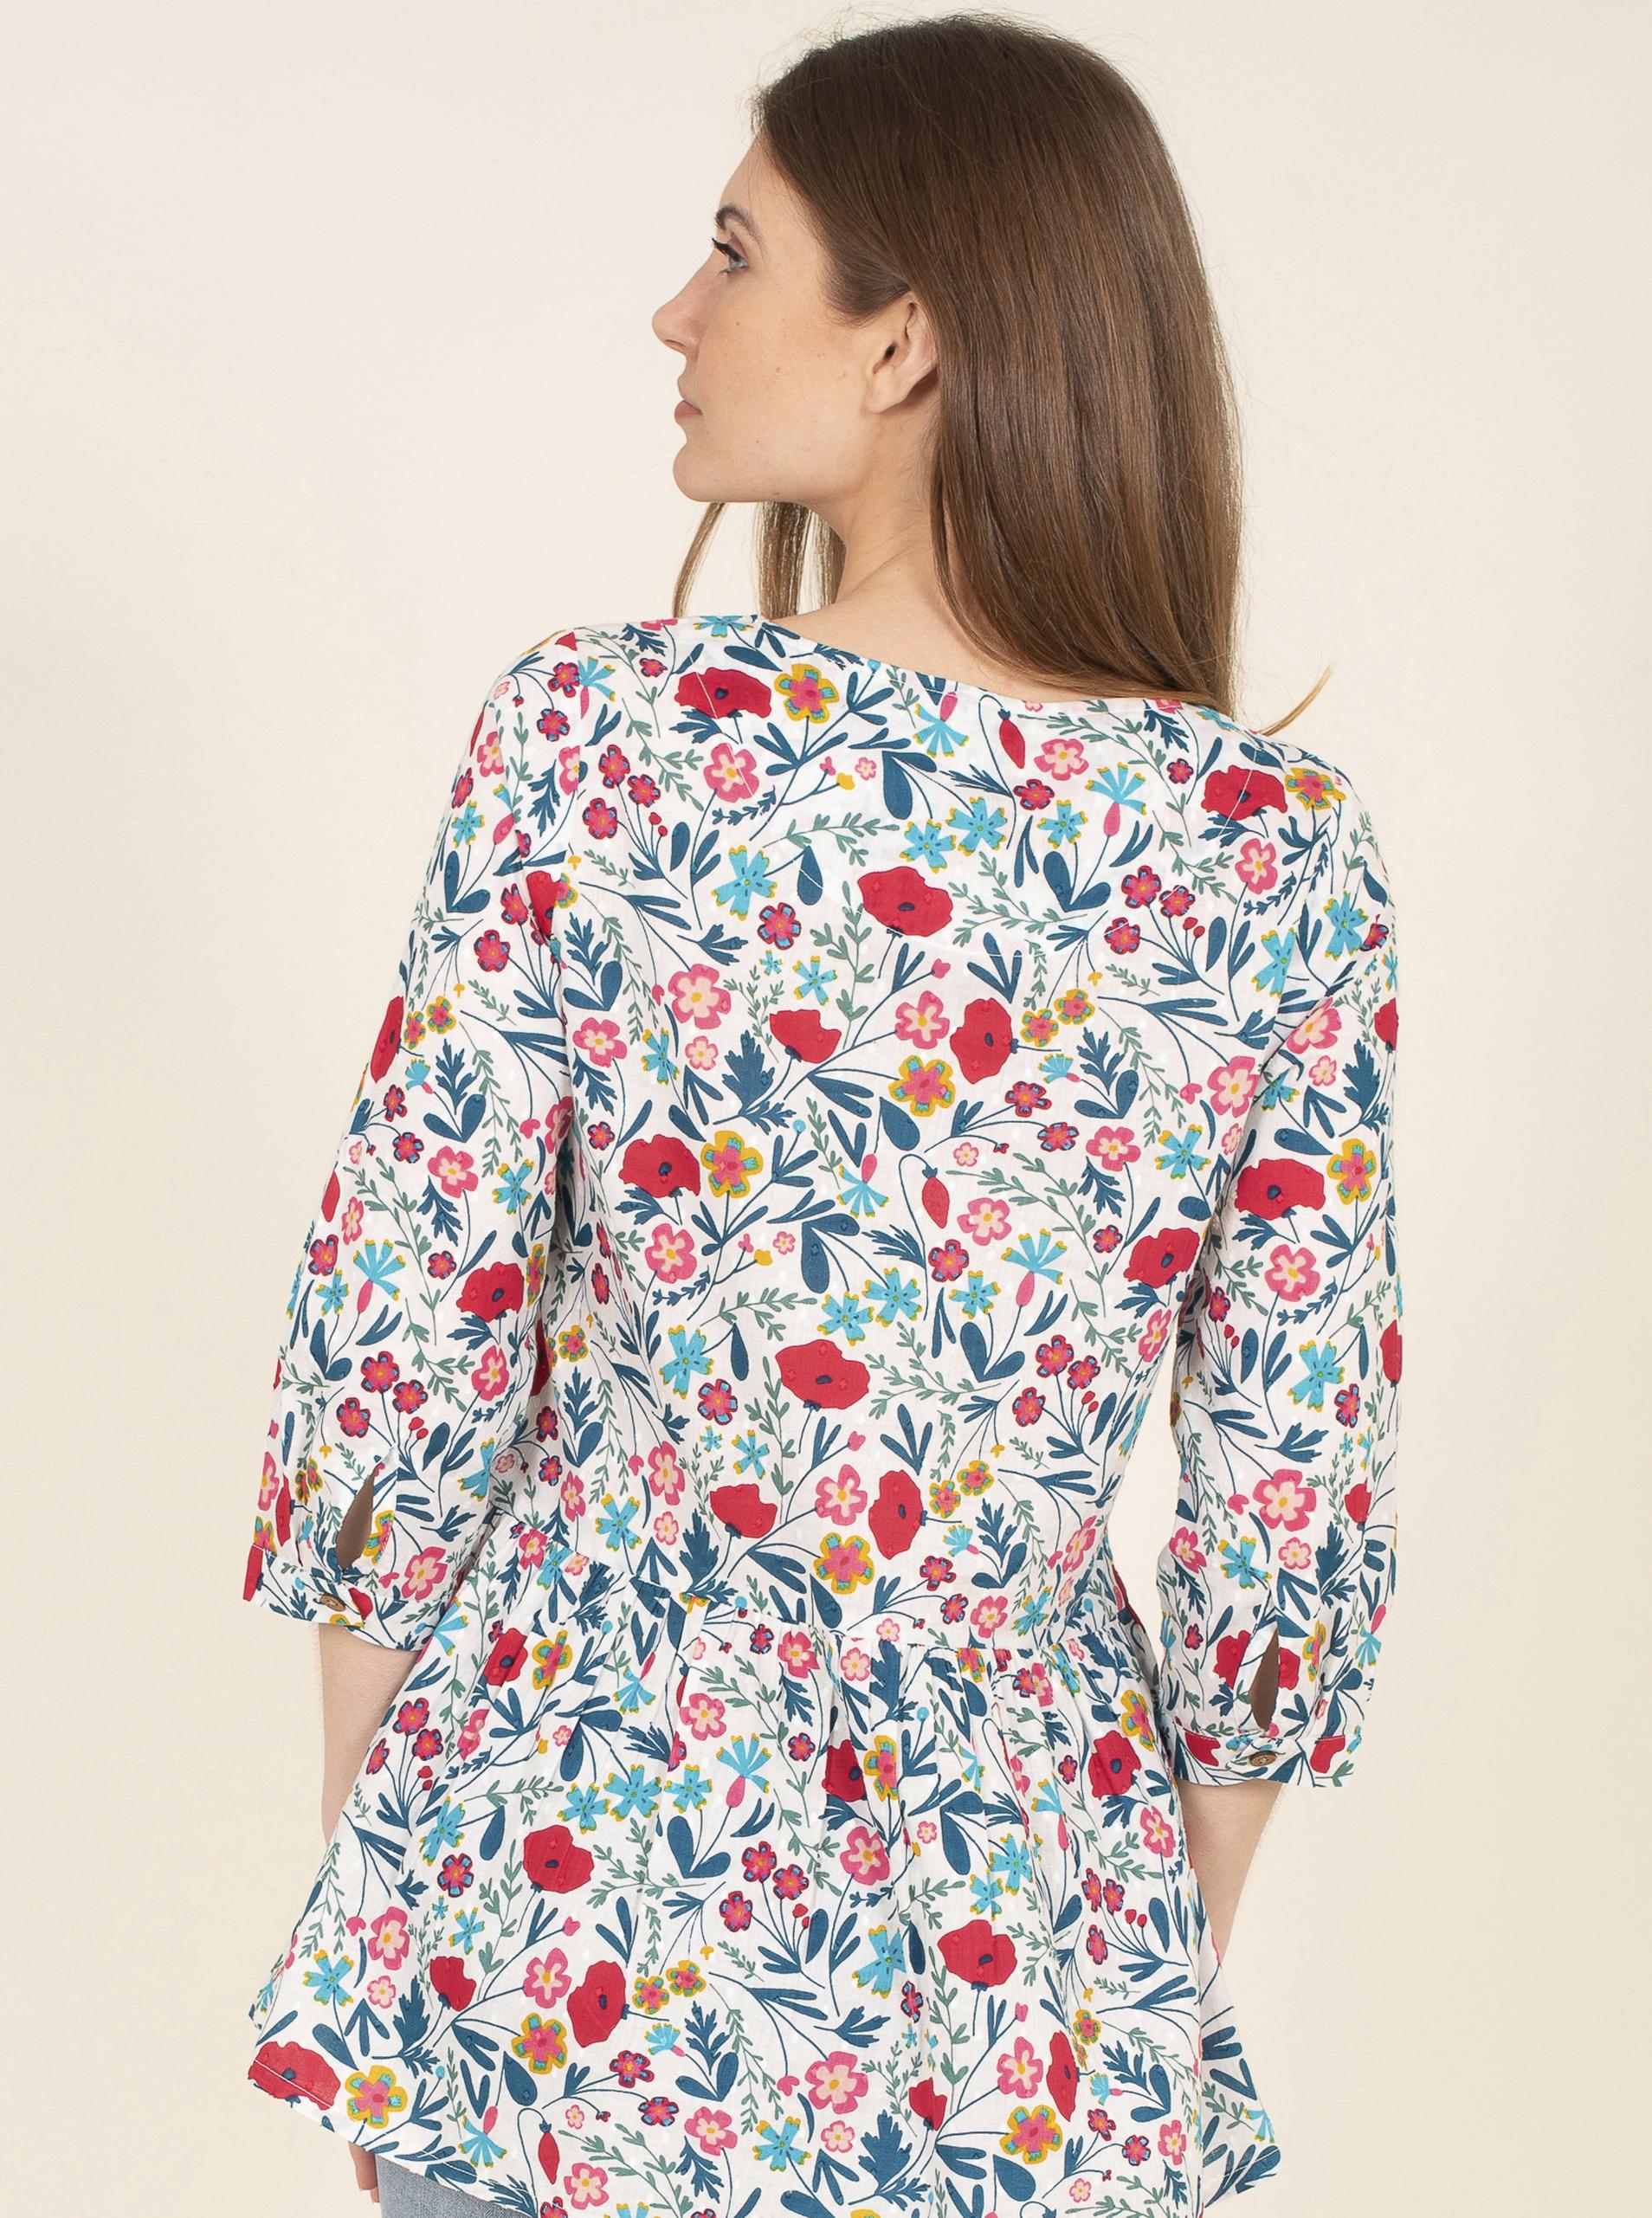 Brakeburn white blouse with floral motif